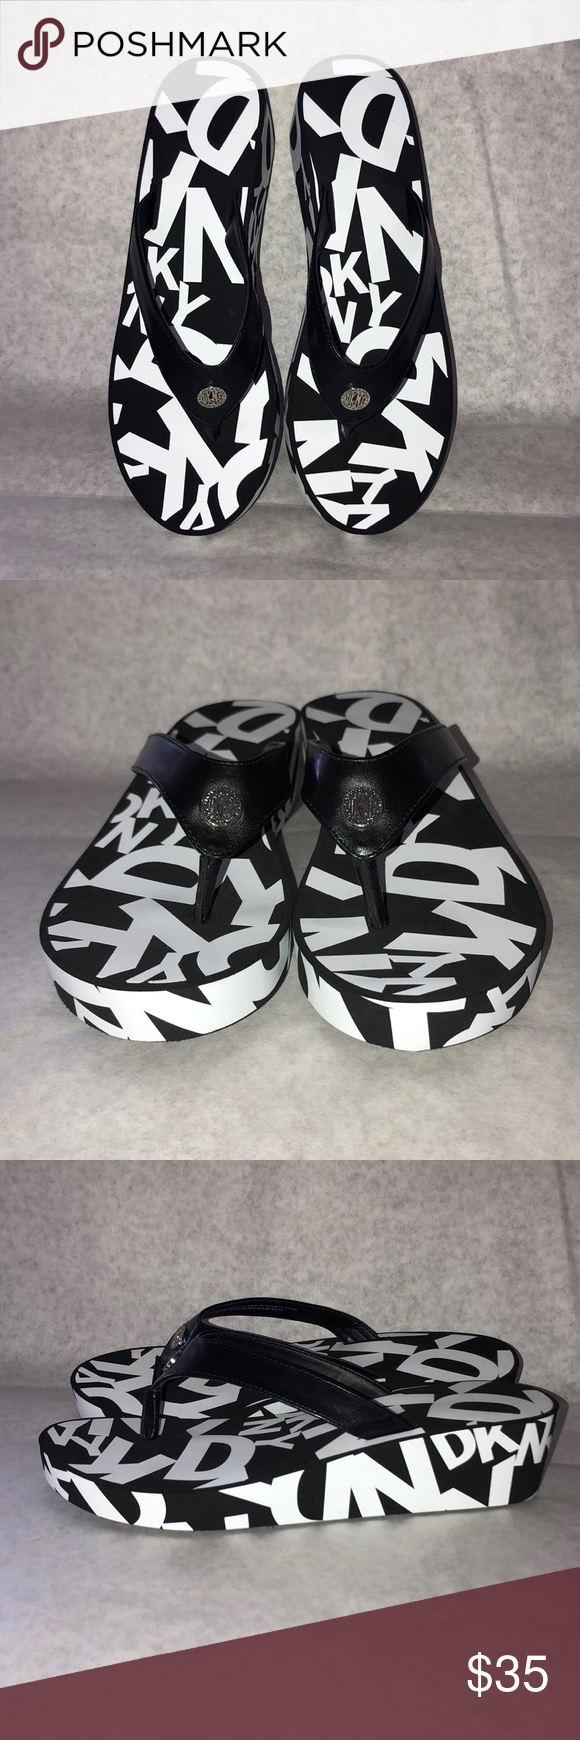 DKNY Sandals 👡 DKNY flip flop with DKNY logo (black and